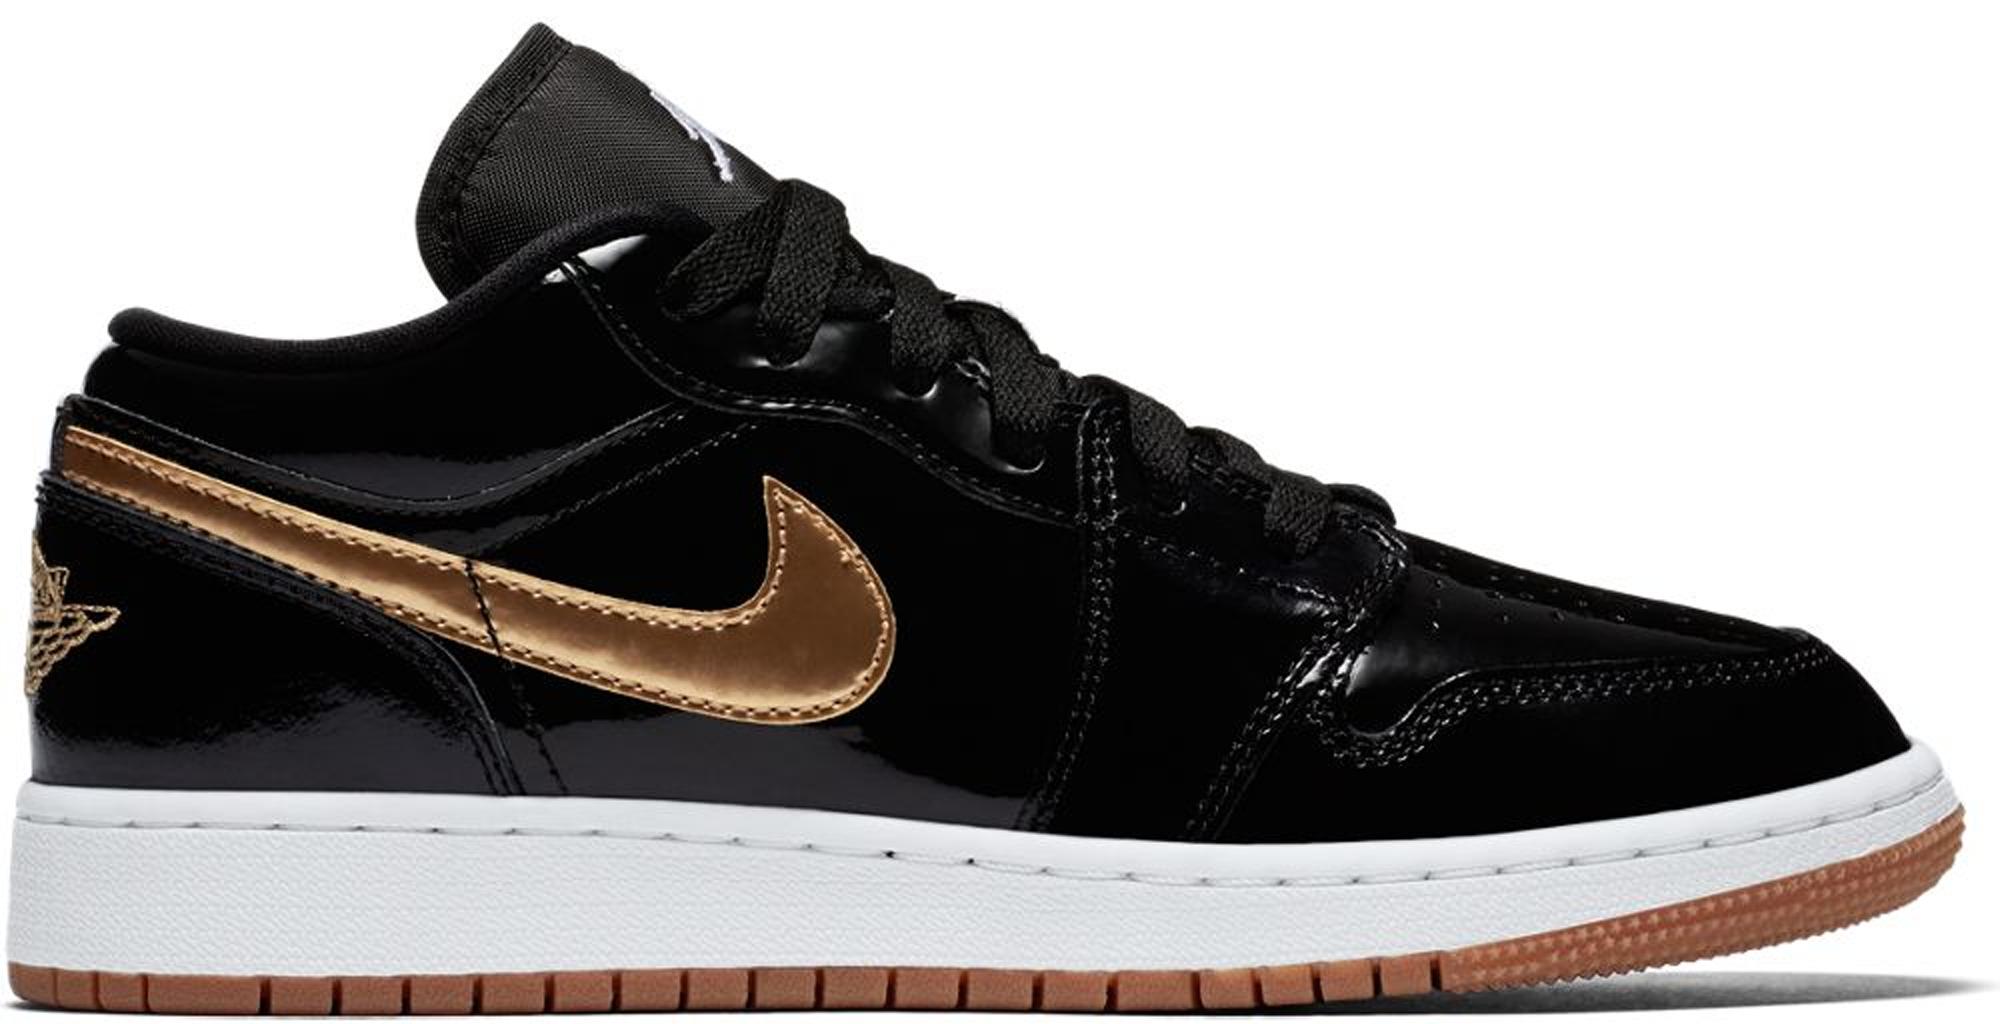 Jordan 1 Retro Low Black Gold Patent